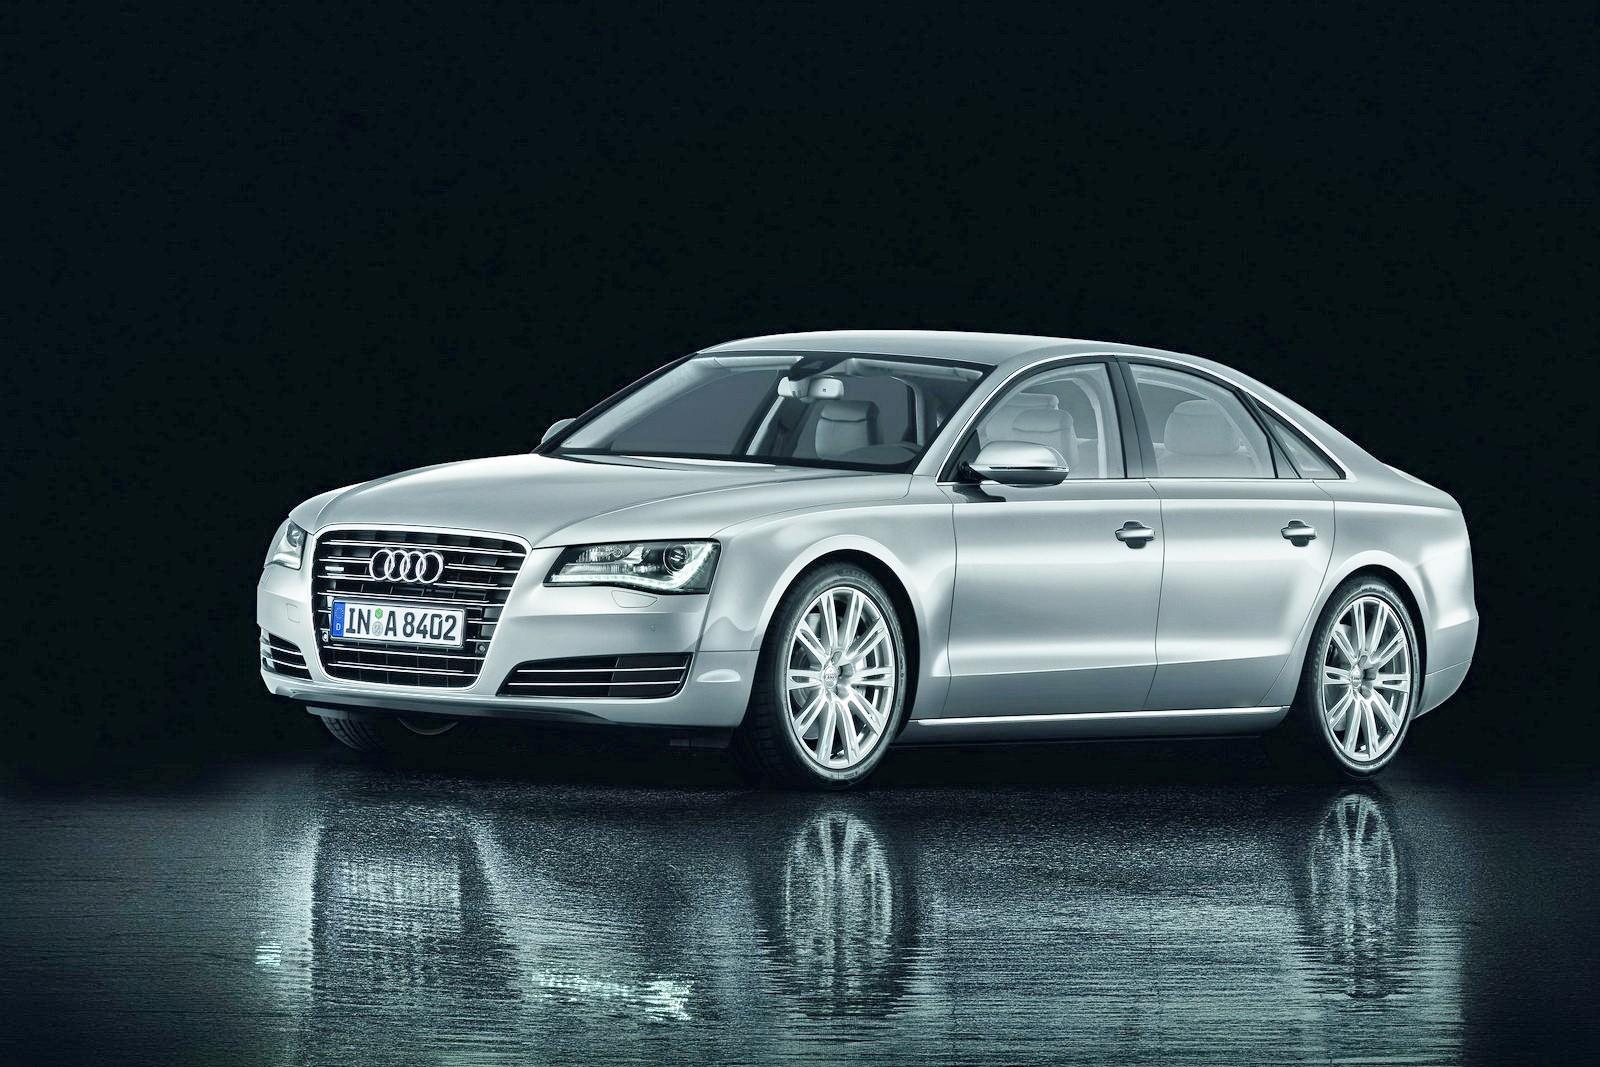 Audi A8 Wallpaper 24 1600x1067